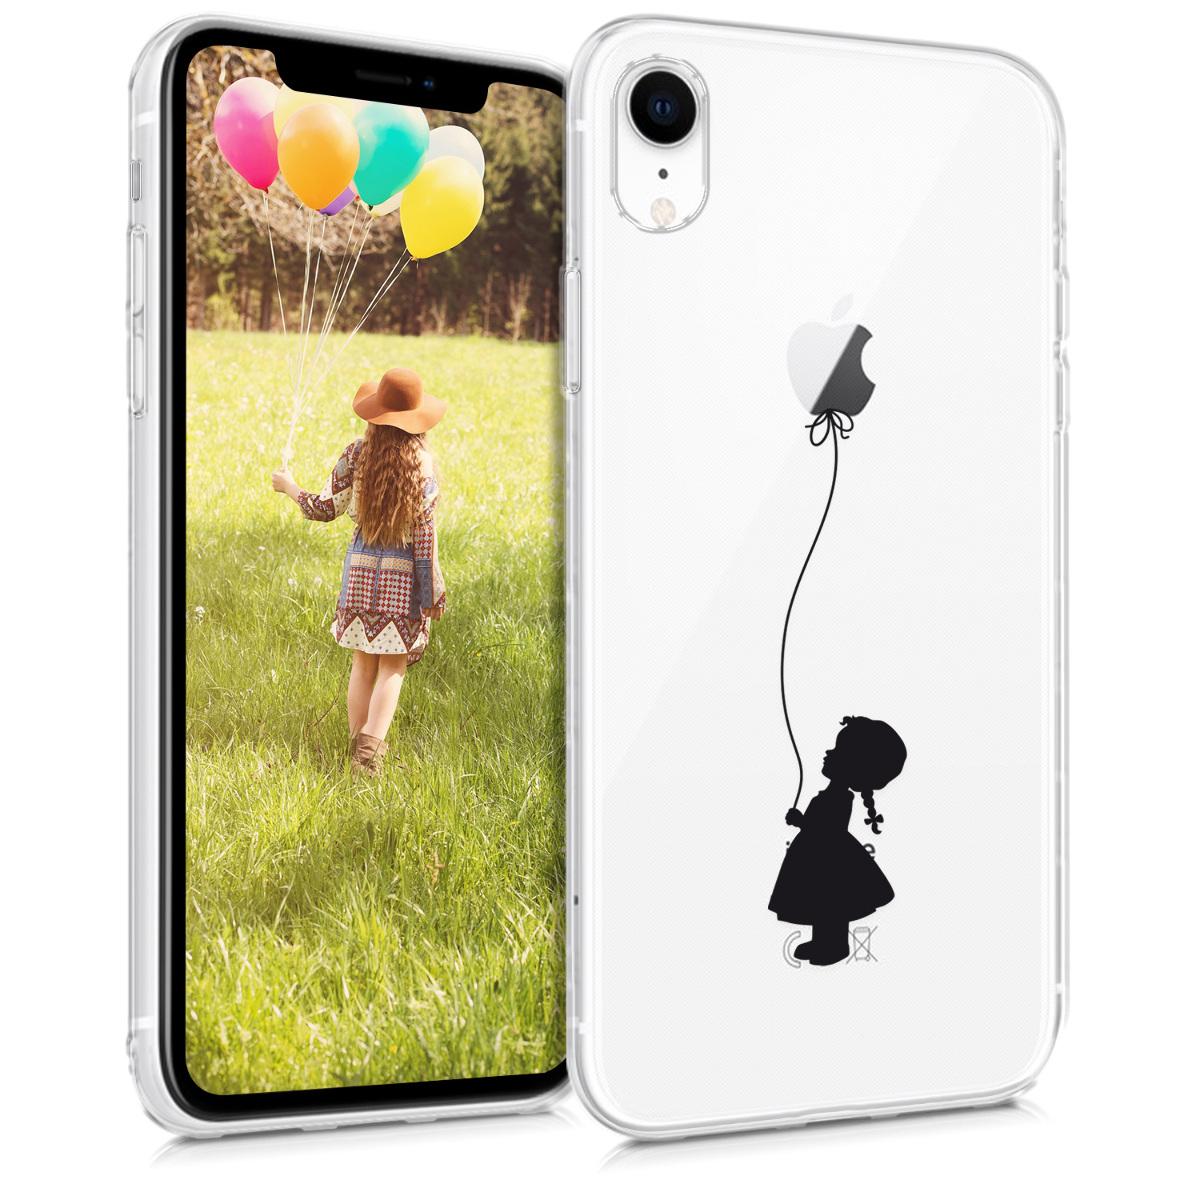 KW Θήκη Σιλικόνης iPhone XR - Black / Transparent (45915.02)